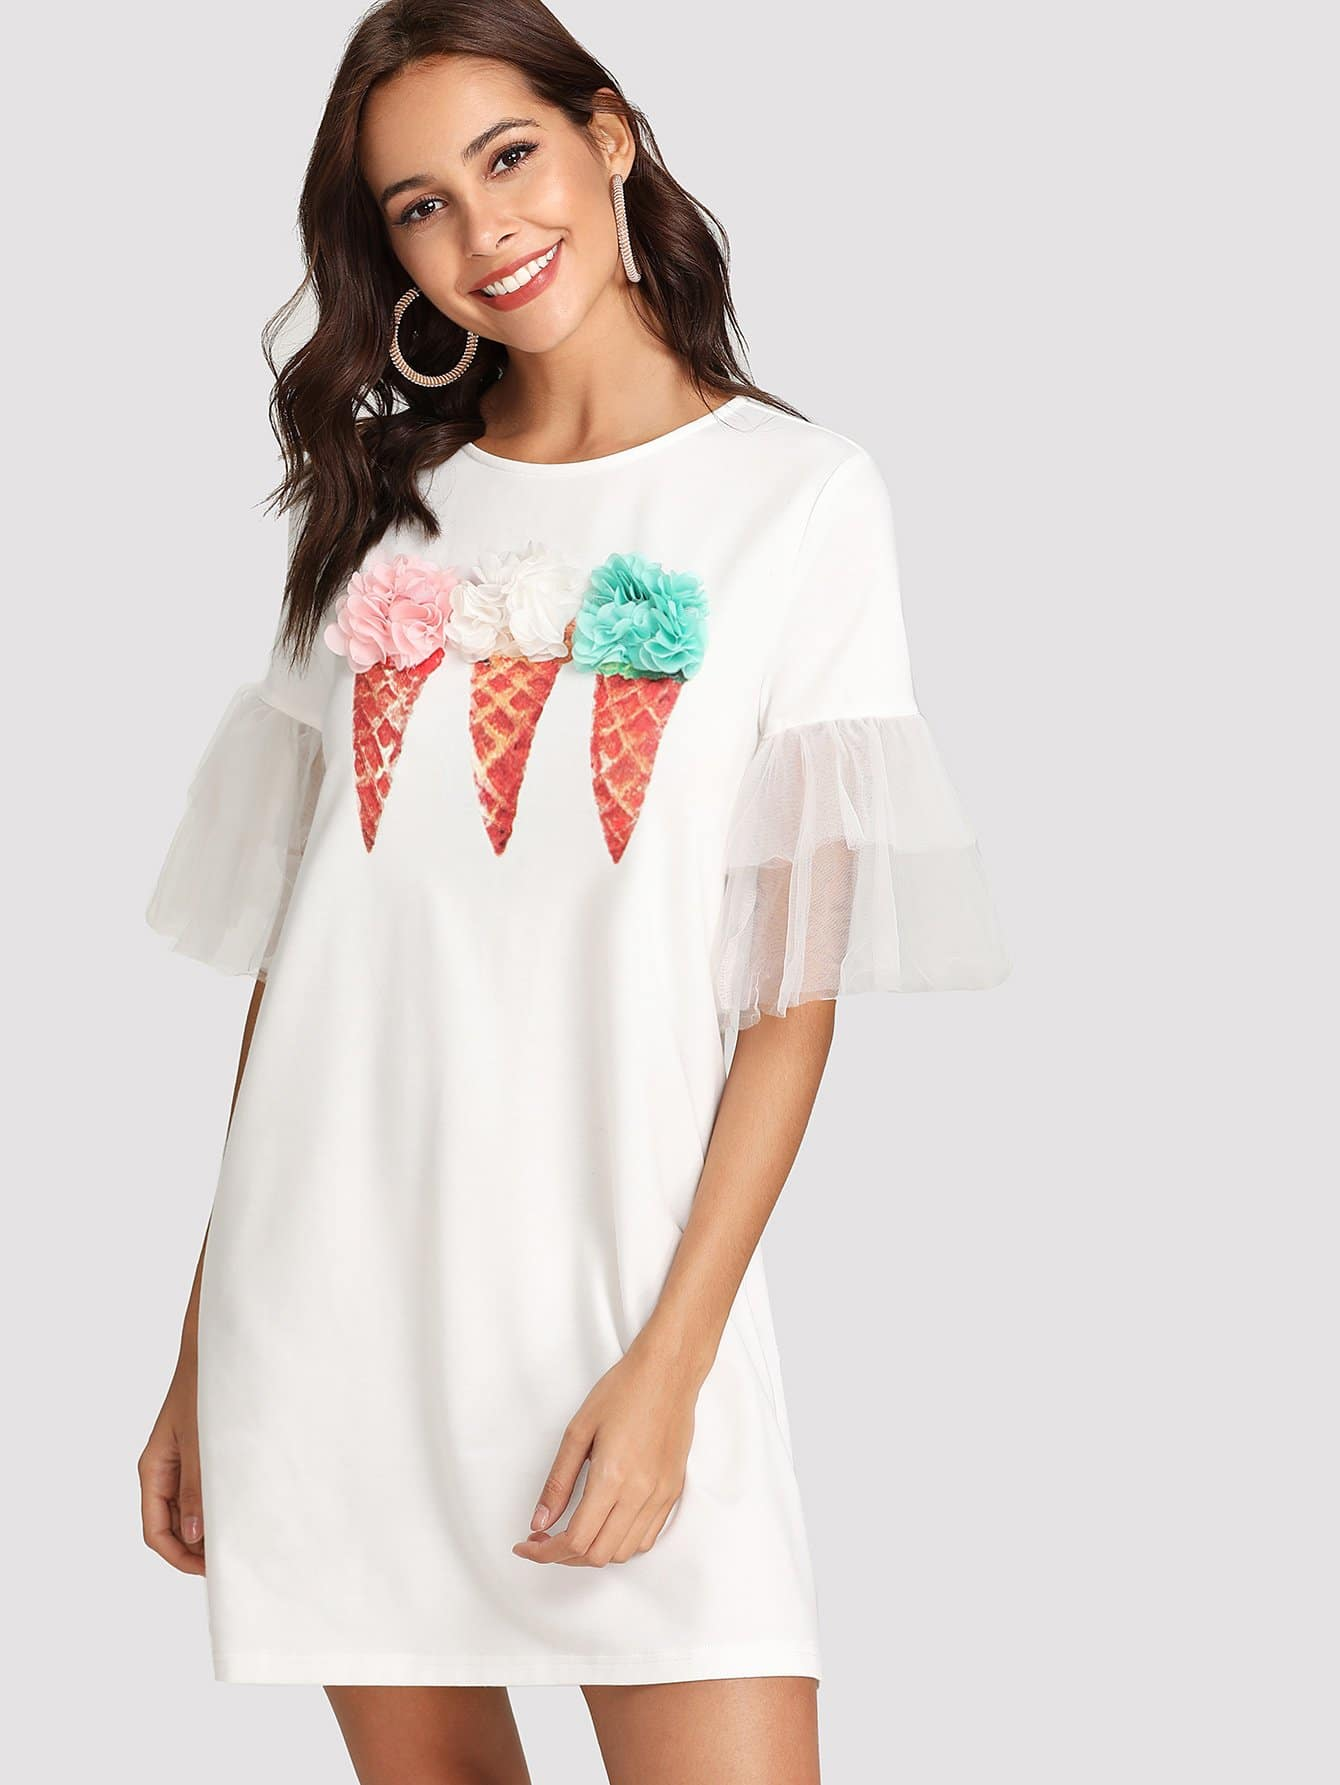 Tiered Mesh Sleeve Applique Ice-Cream Dress swan print tiered mesh dress